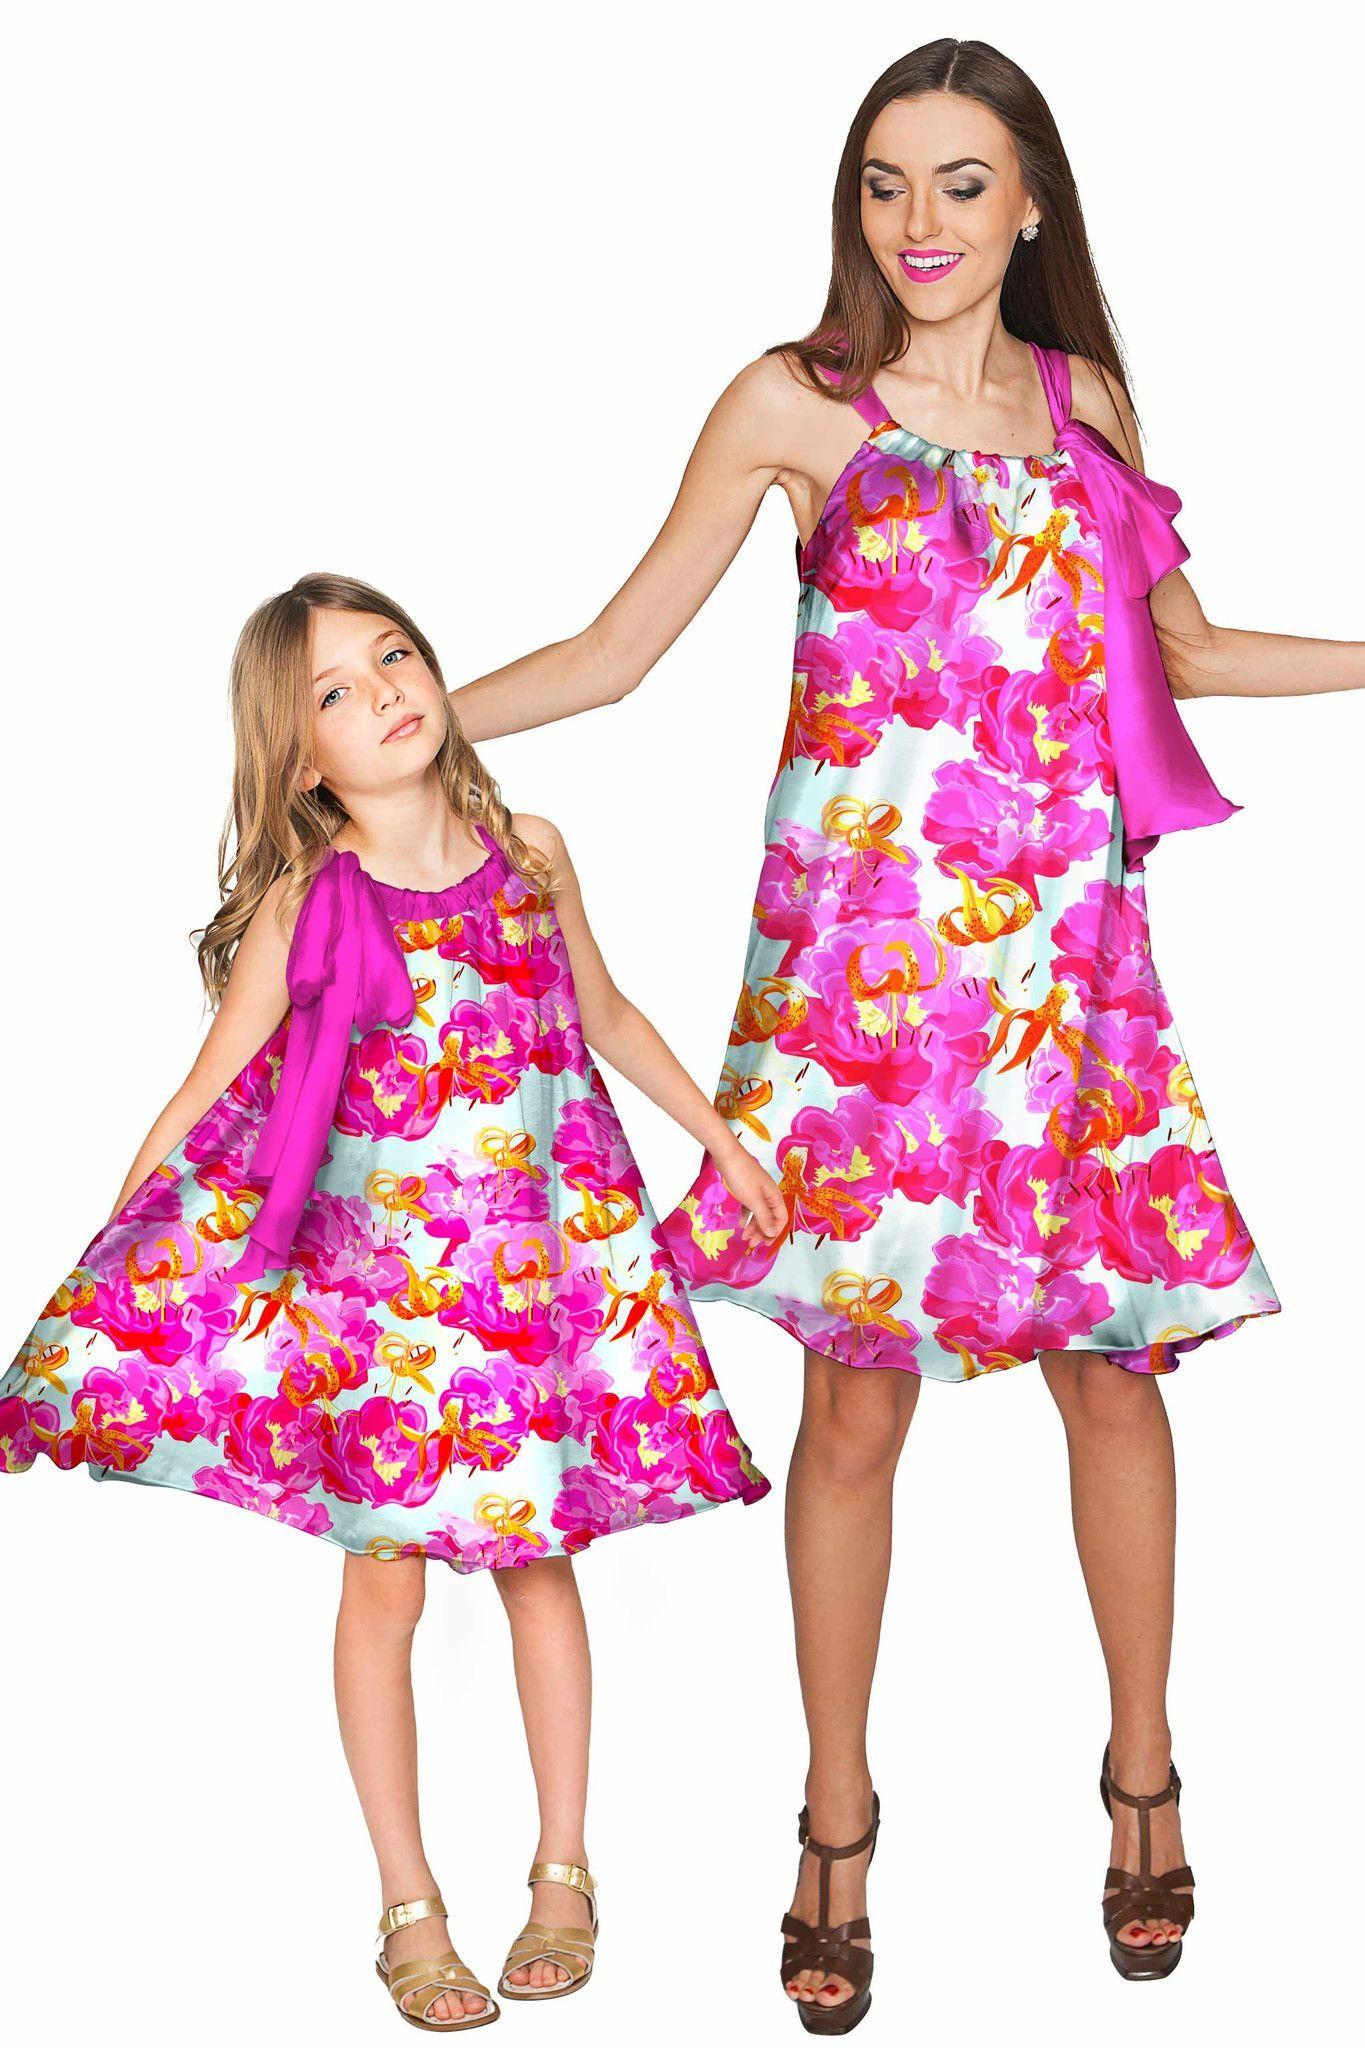 da044318f6b0 Sweet Illusion Melody Swing Chiffon Mother and Daughter Dress ...